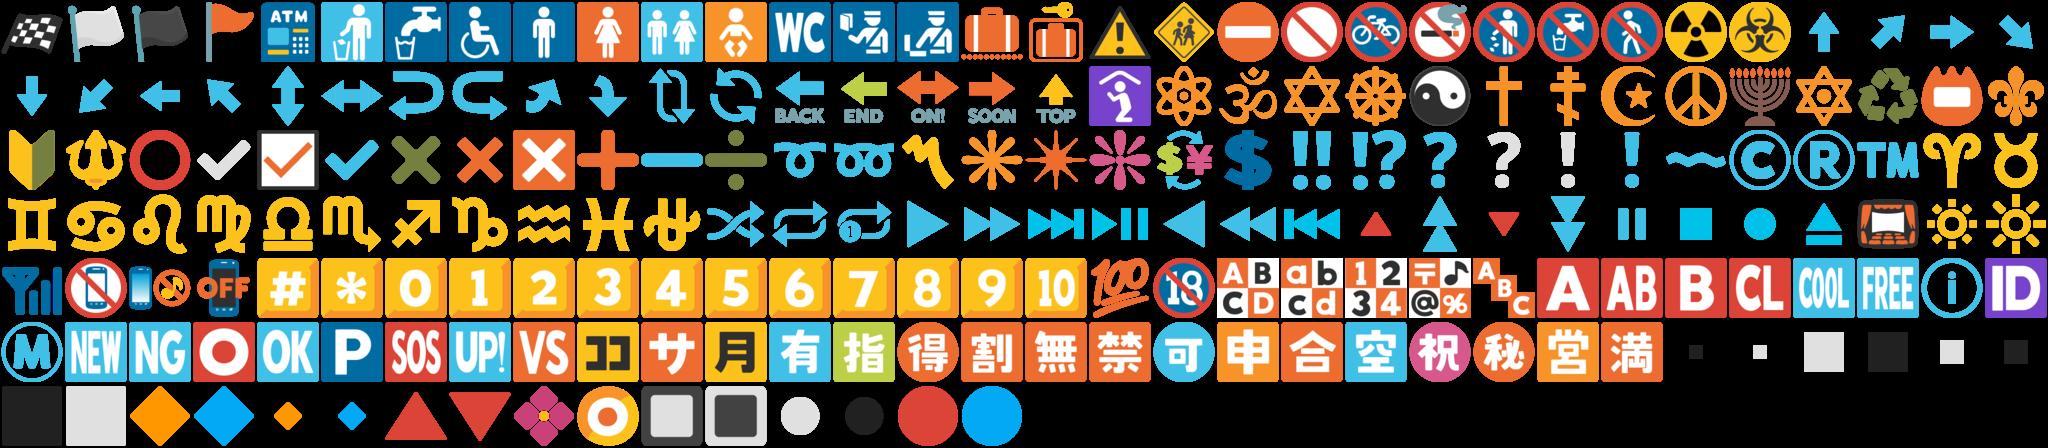 briar-android/src/main/assets/emoji_symbols.png